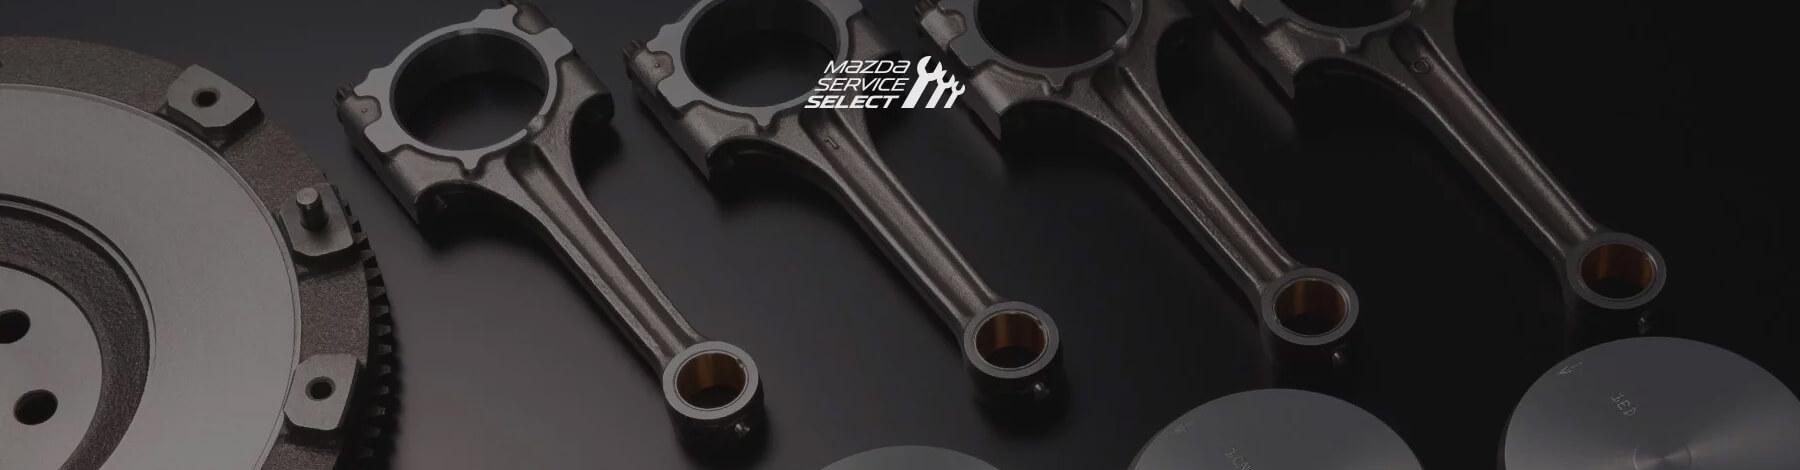 Mazda Service Select